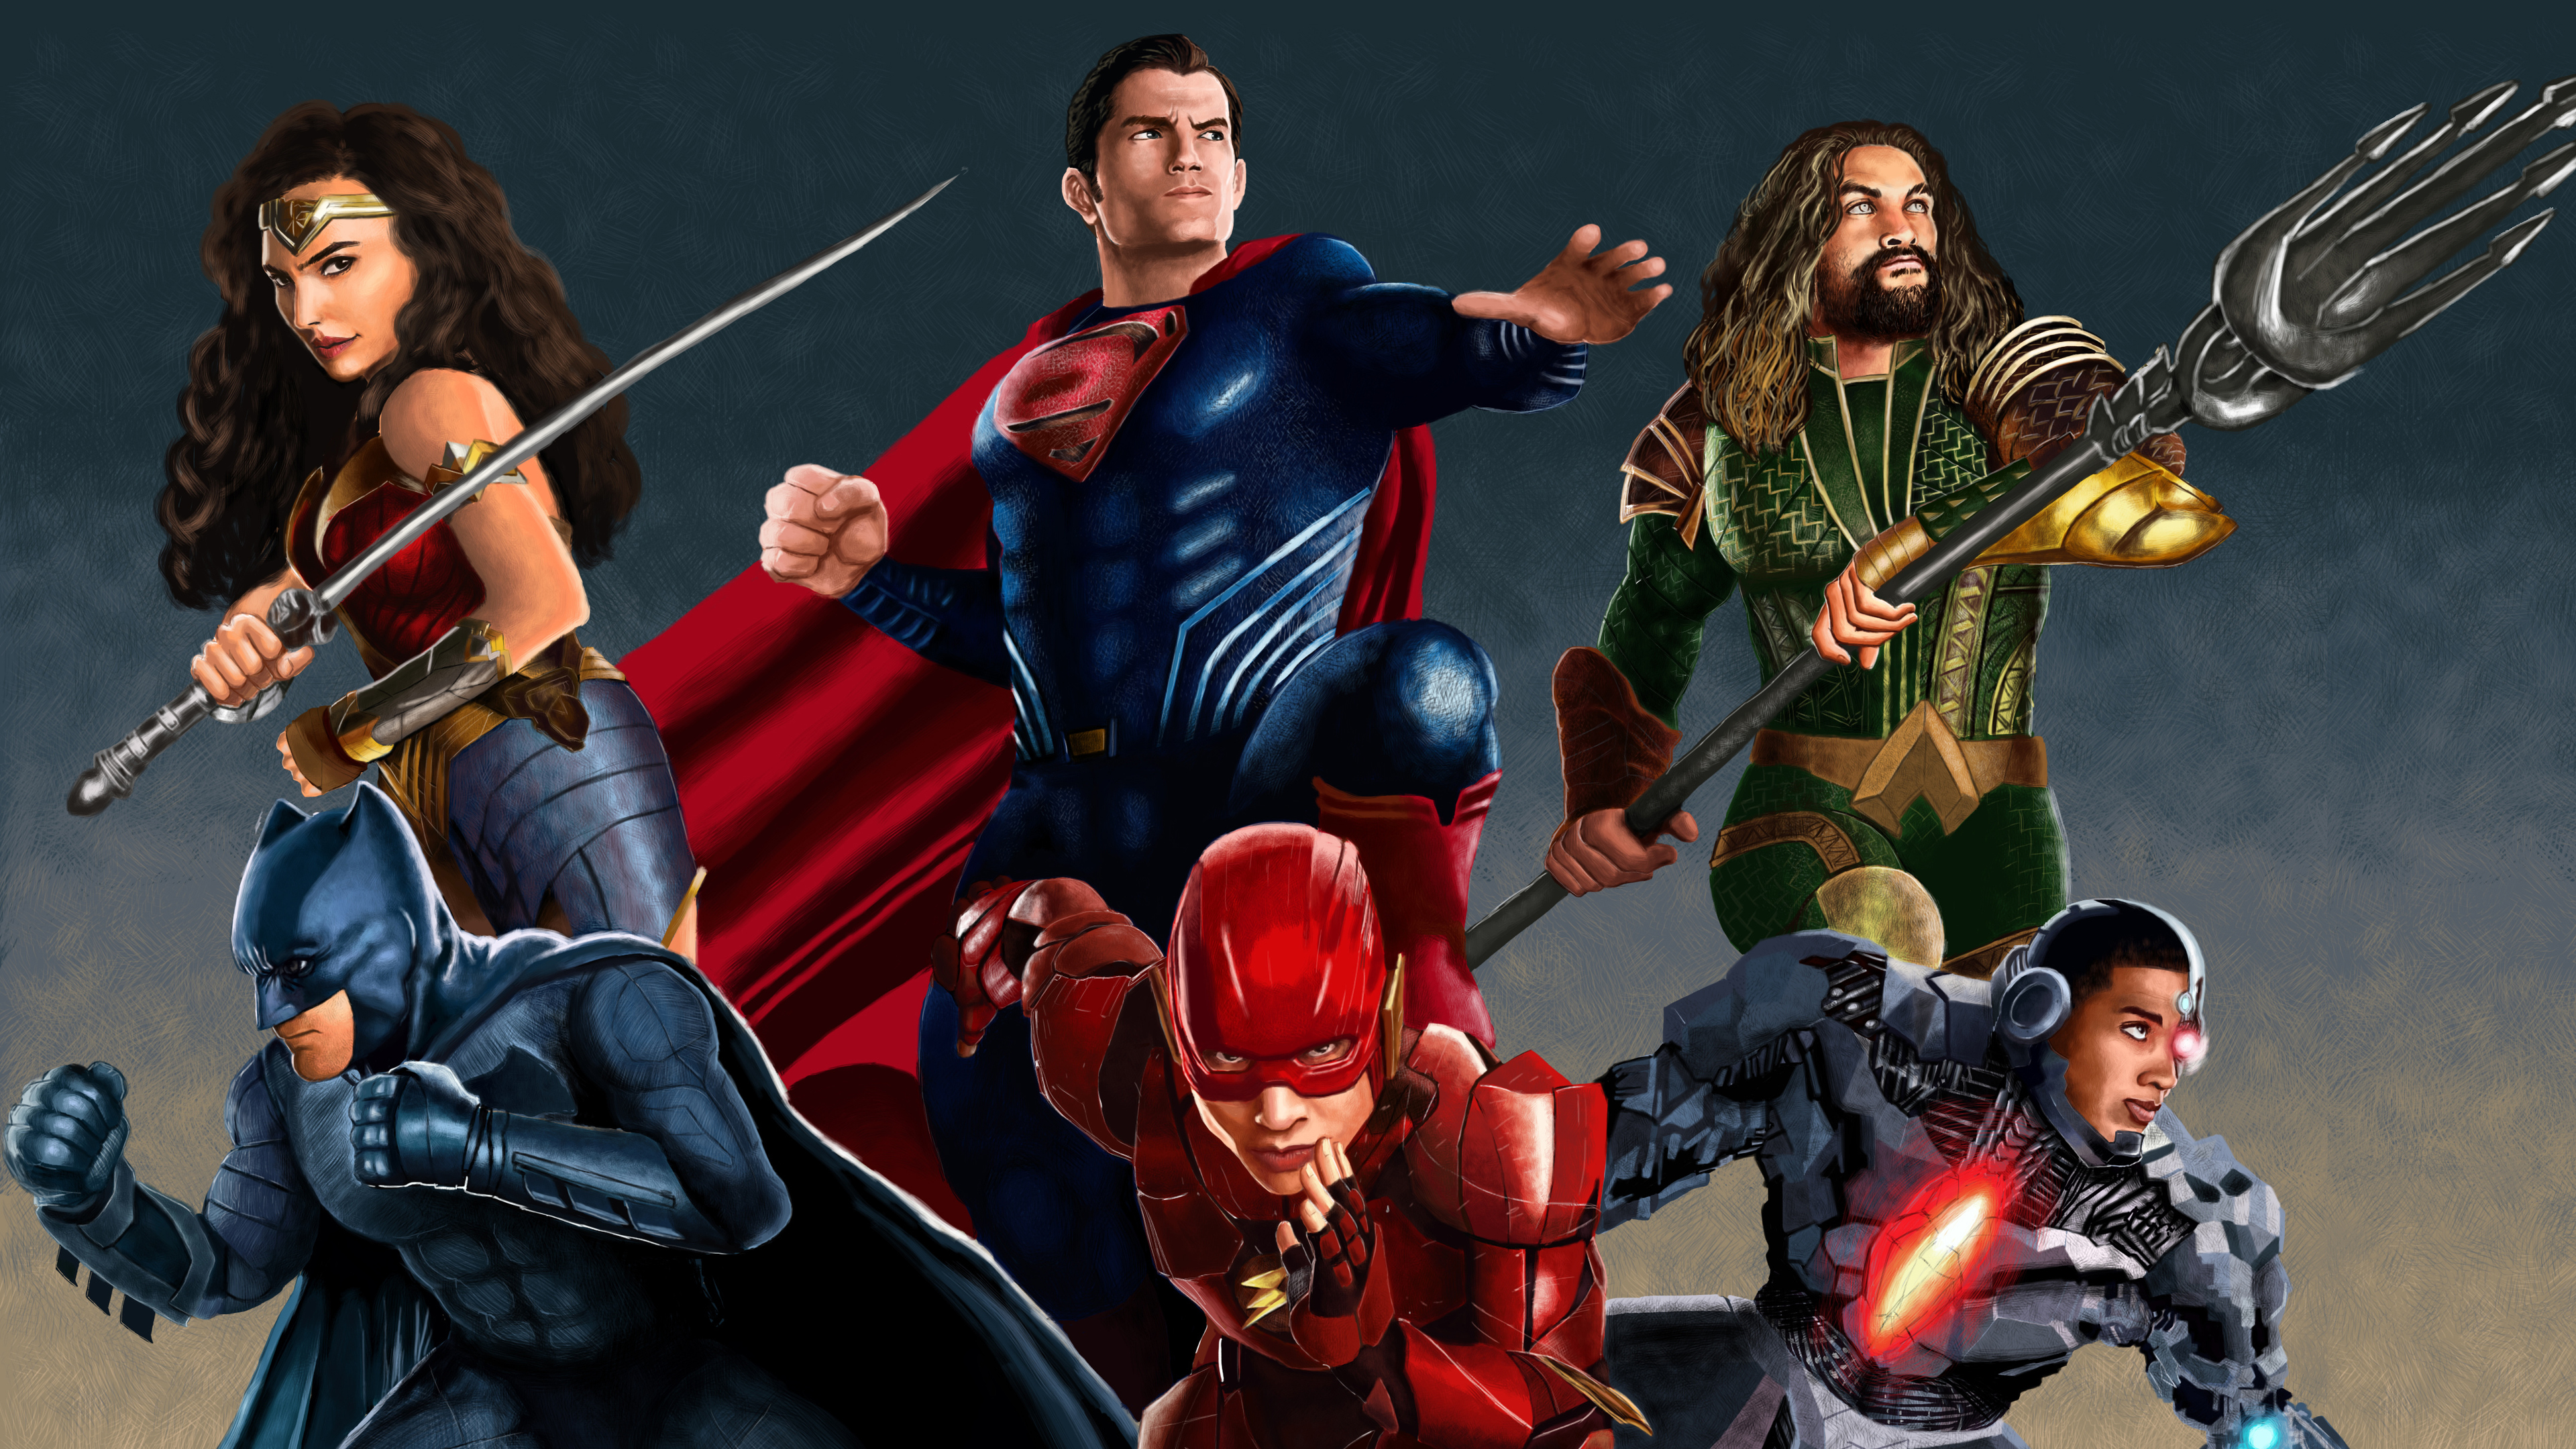 Wallpaper 4k Justice League Artworks 4k 4k Wallpapers